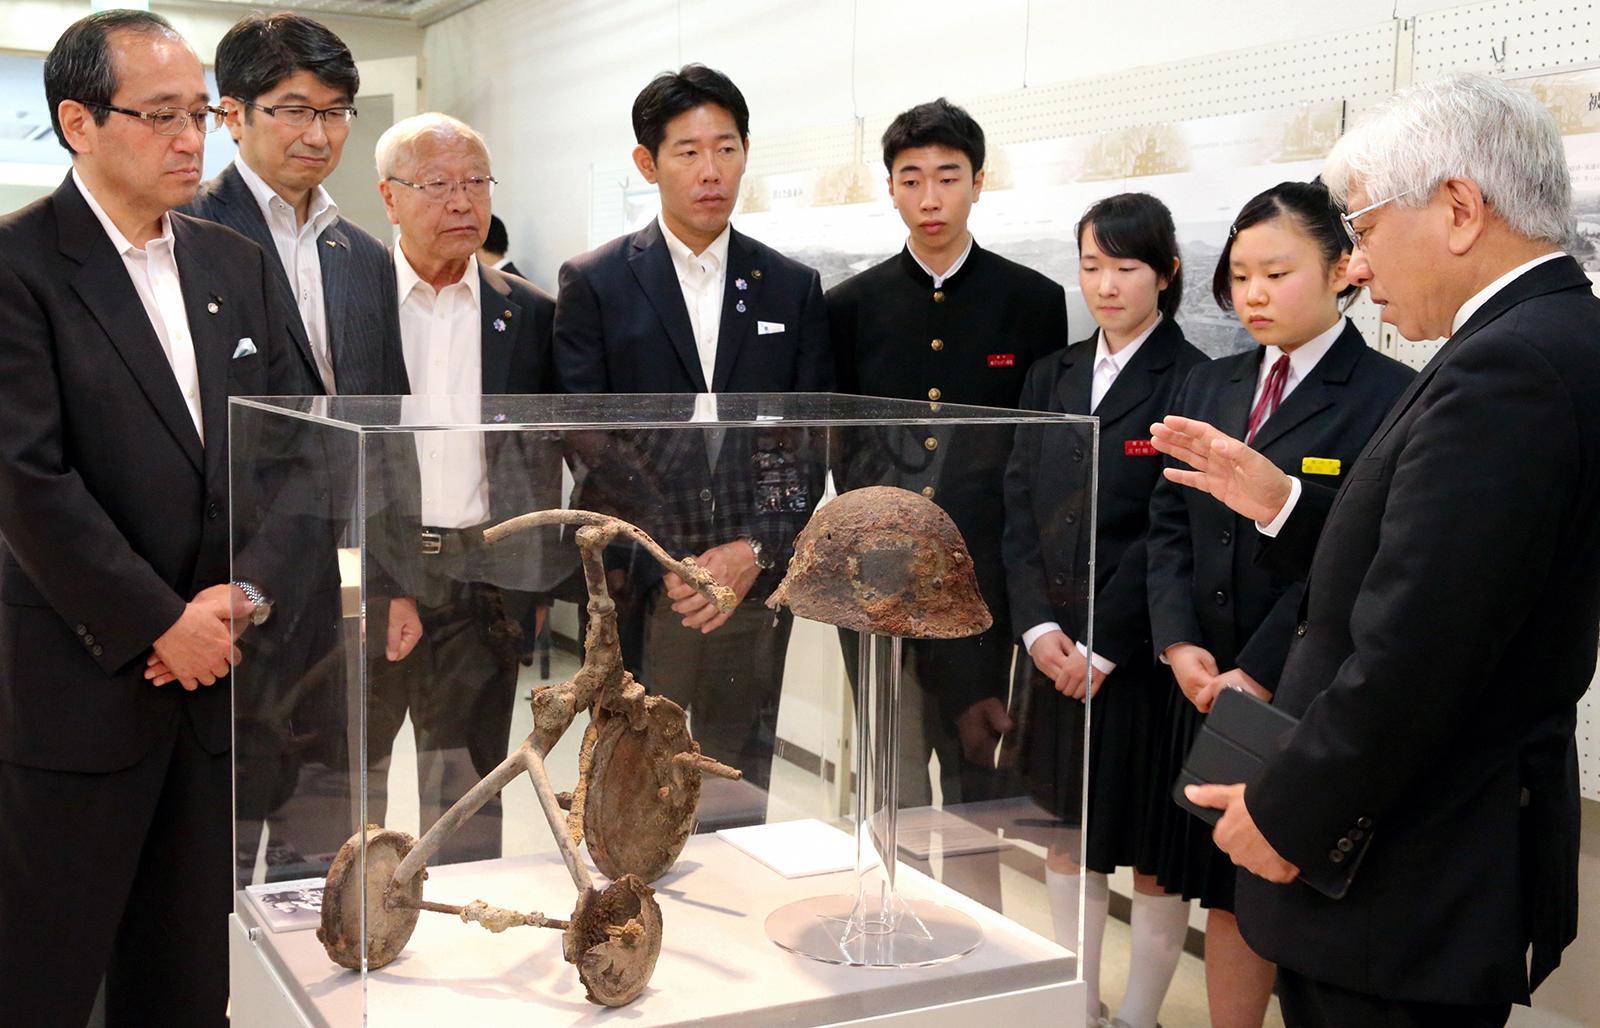 Hiroshima Mayor Kazumi Matsui (far left) standing next to Nagasaki Mayor Tomihisa Taue as they look at a display with local students at the Hiroshima-Nagasaki Atomic Bomb Exhibition in 2016. (Credit: The Asahi Shimbun via Getty Images)